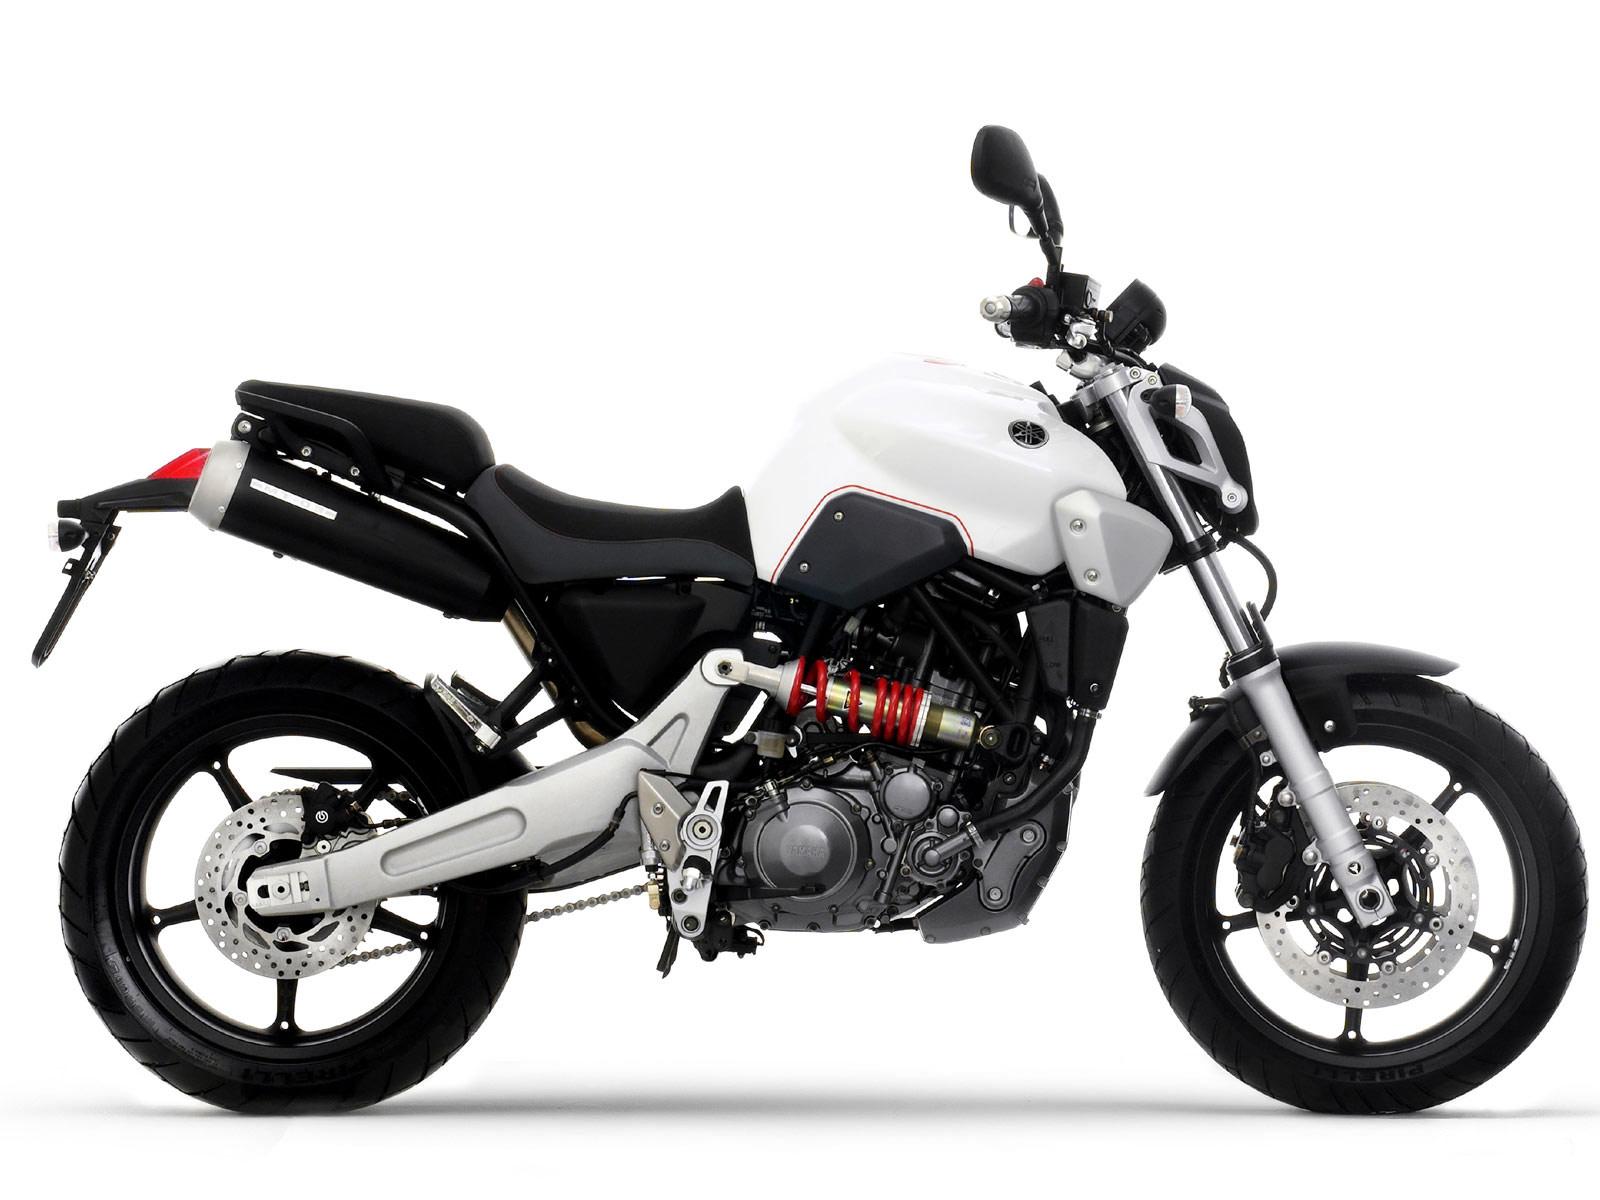 2006 Yamaha MT-03: pics, specs and information